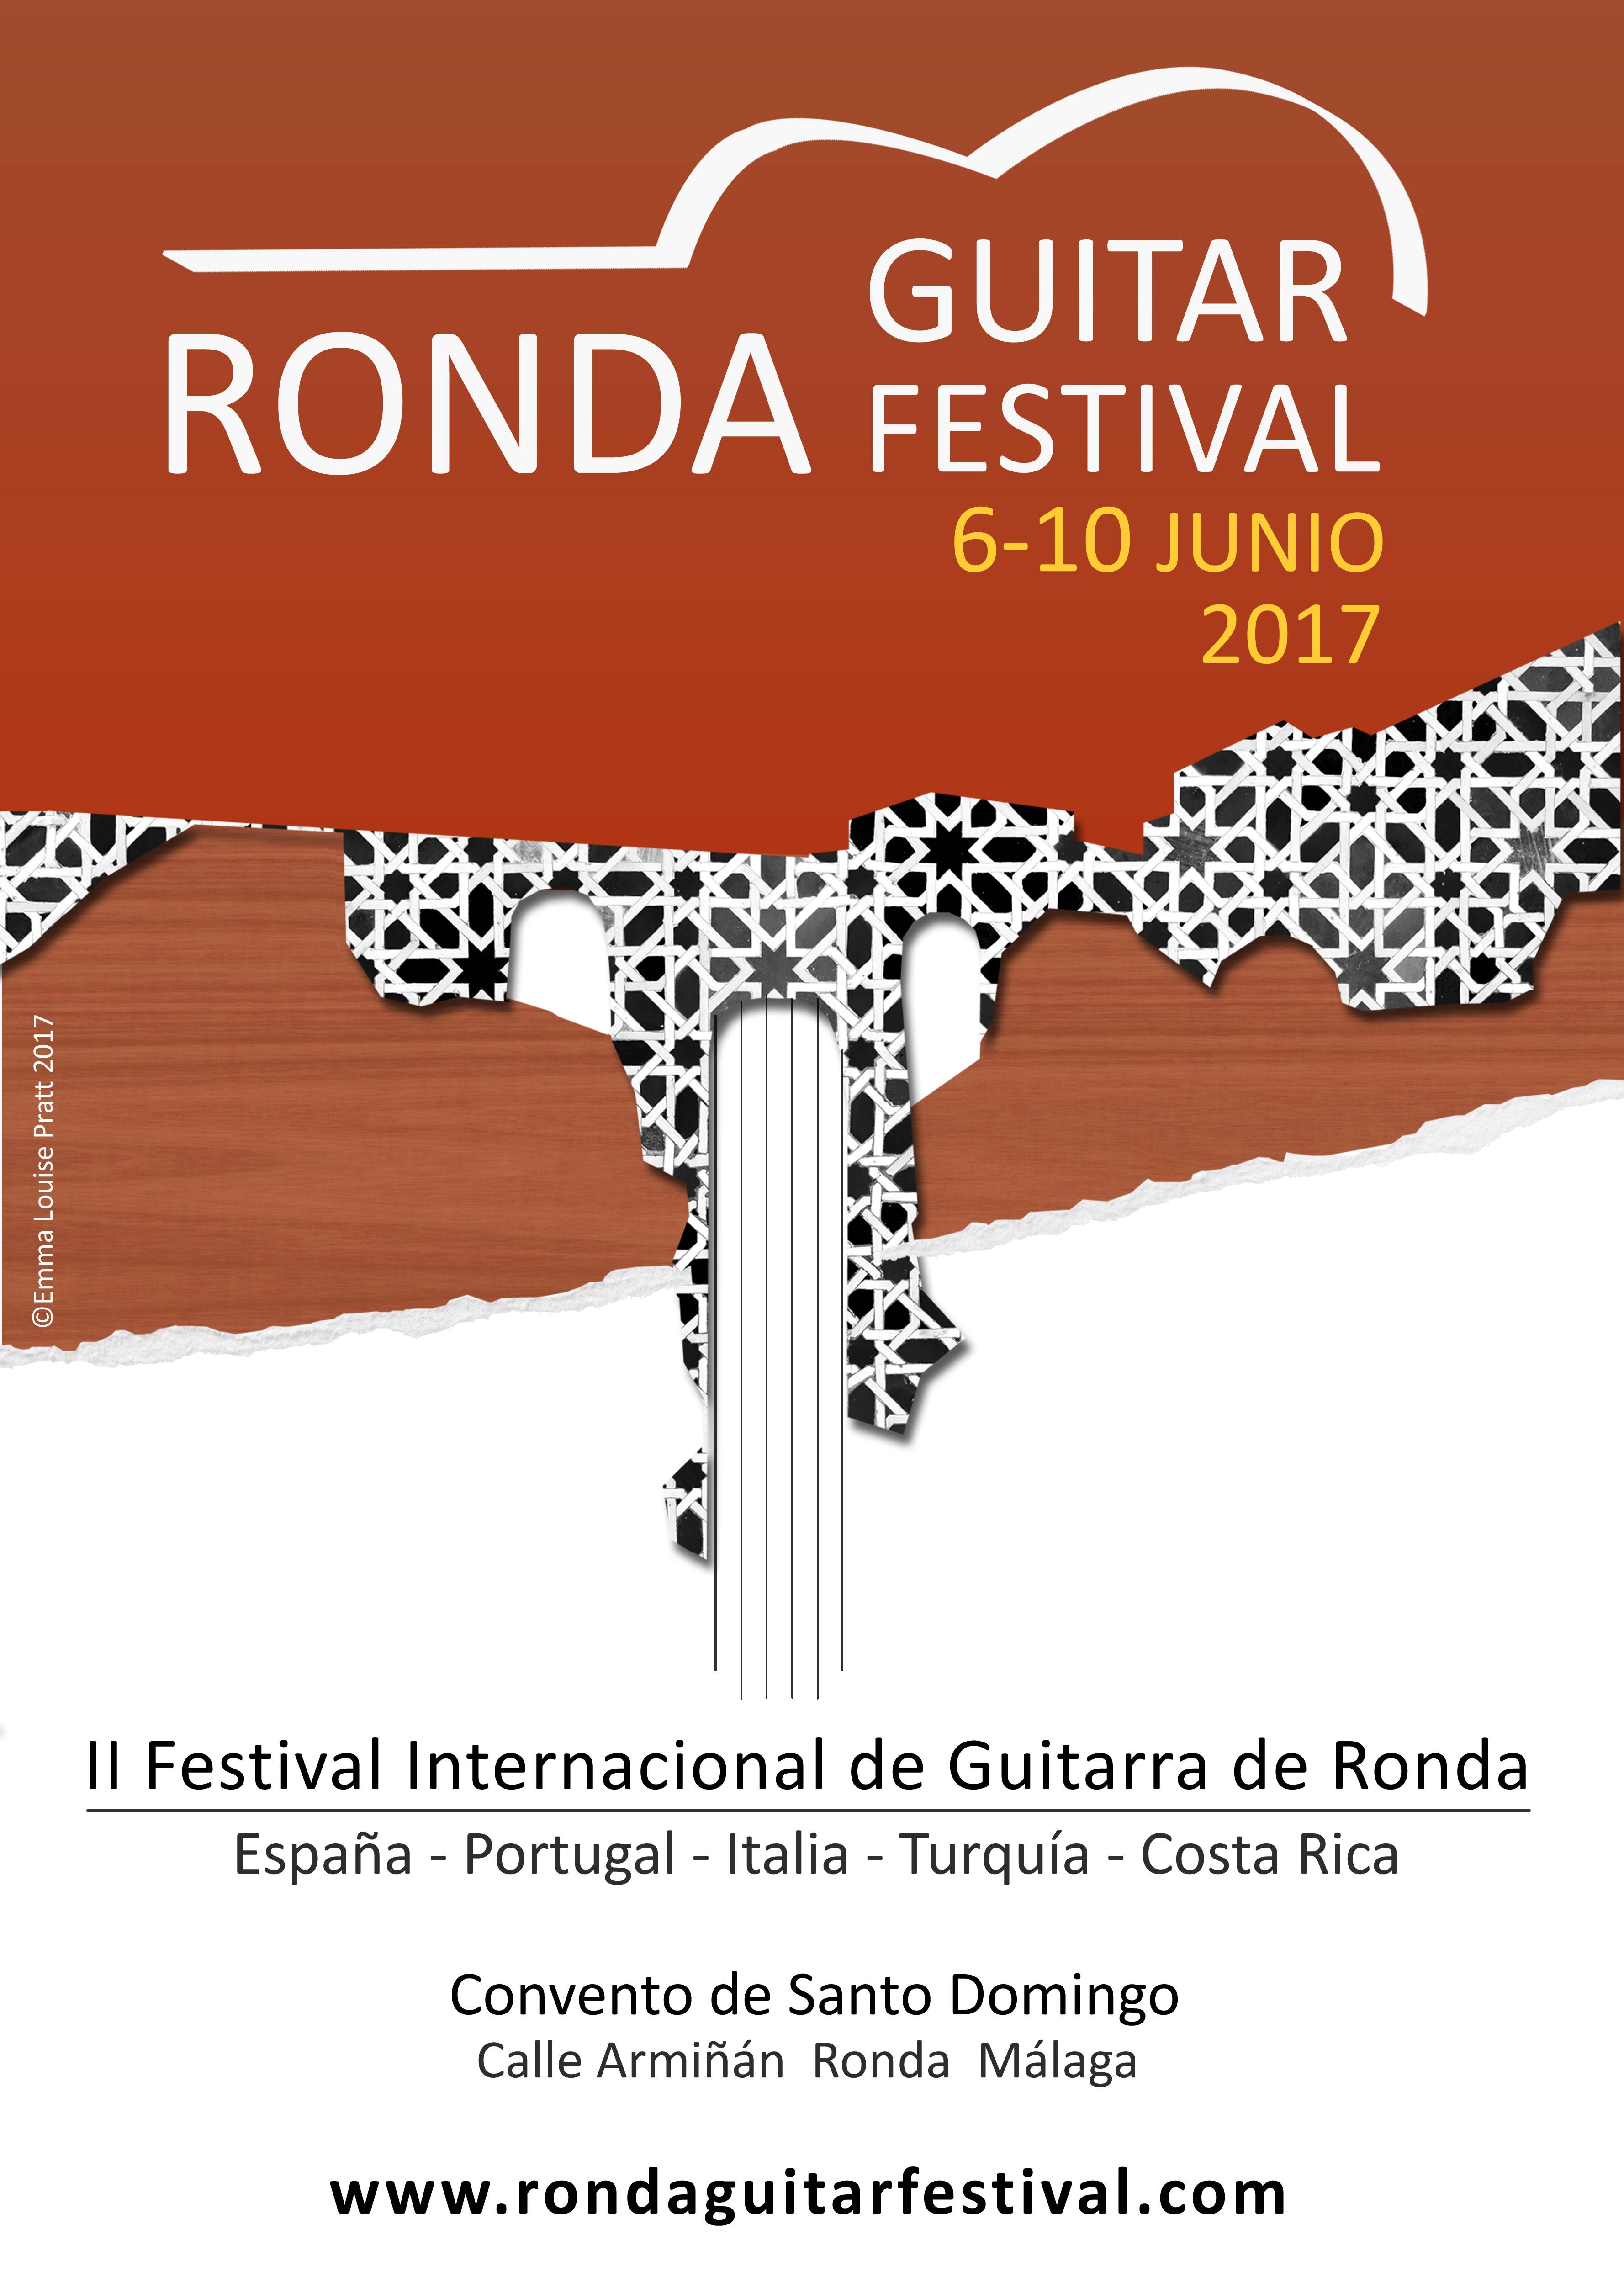 II Ronda Guitar Festival